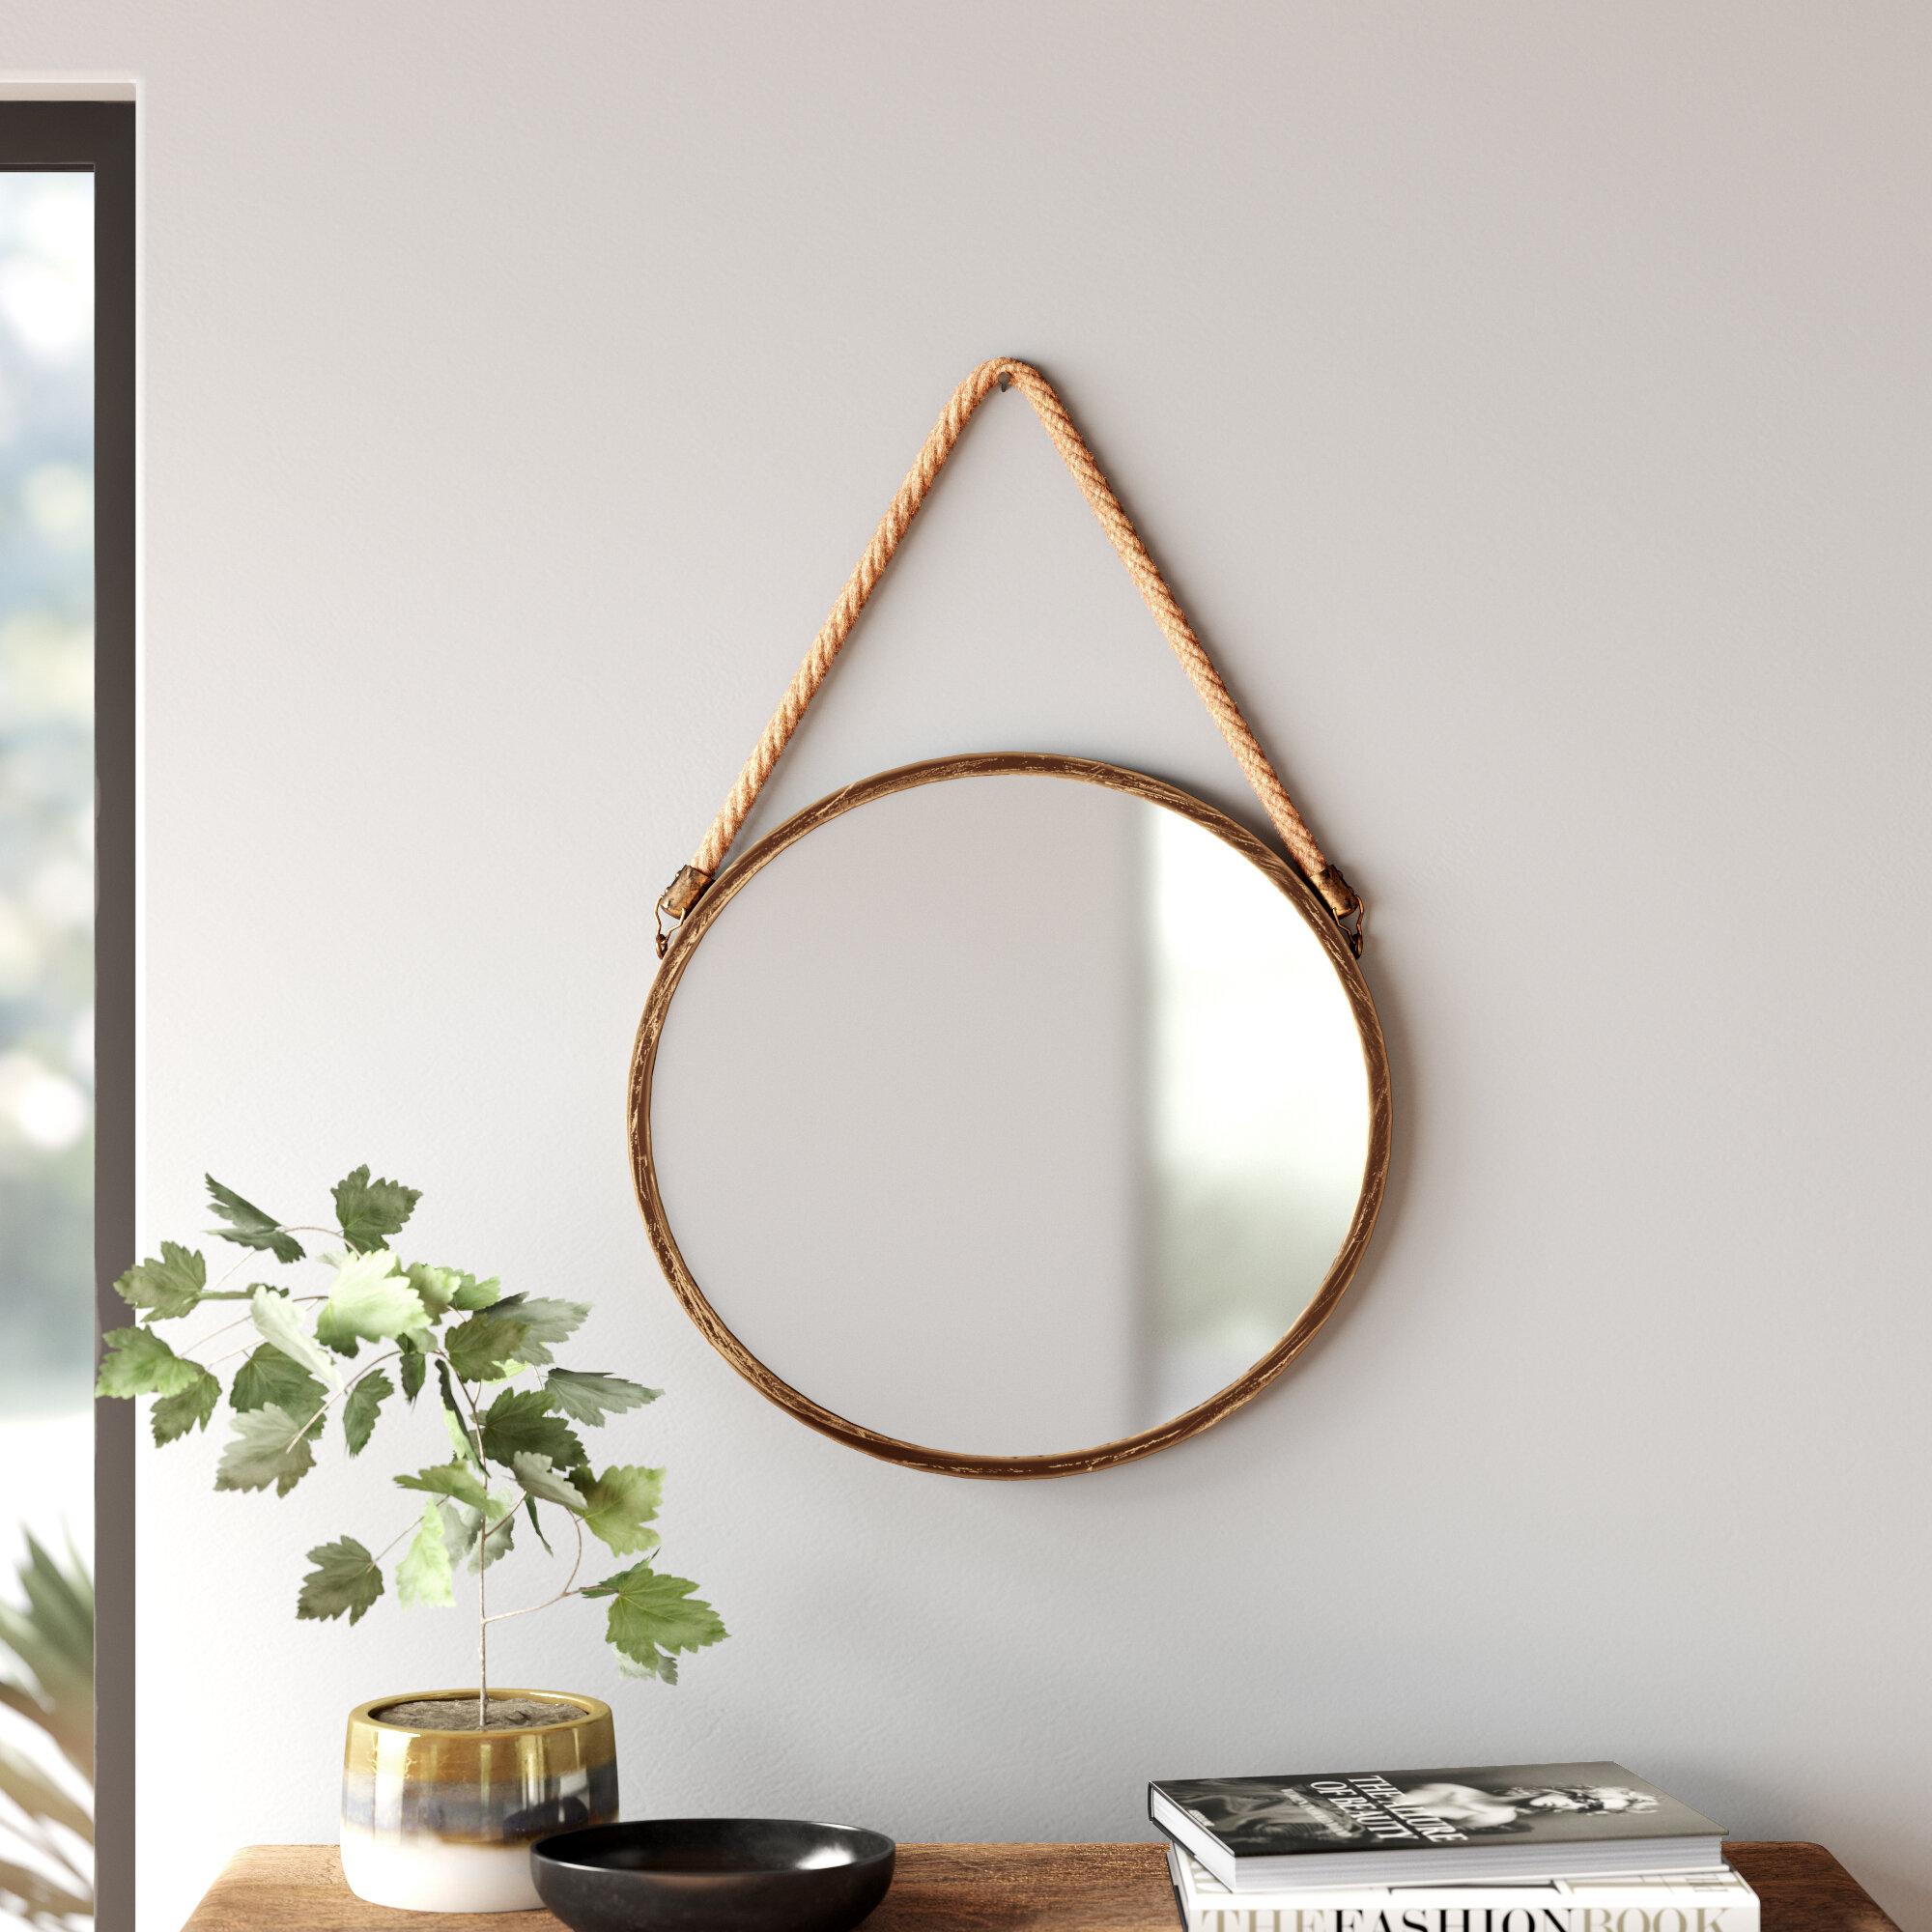 Modern & Contemporary Rope Hanging Mirror | Allmodern Regarding Kayden Accent Mirrors (View 19 of 20)